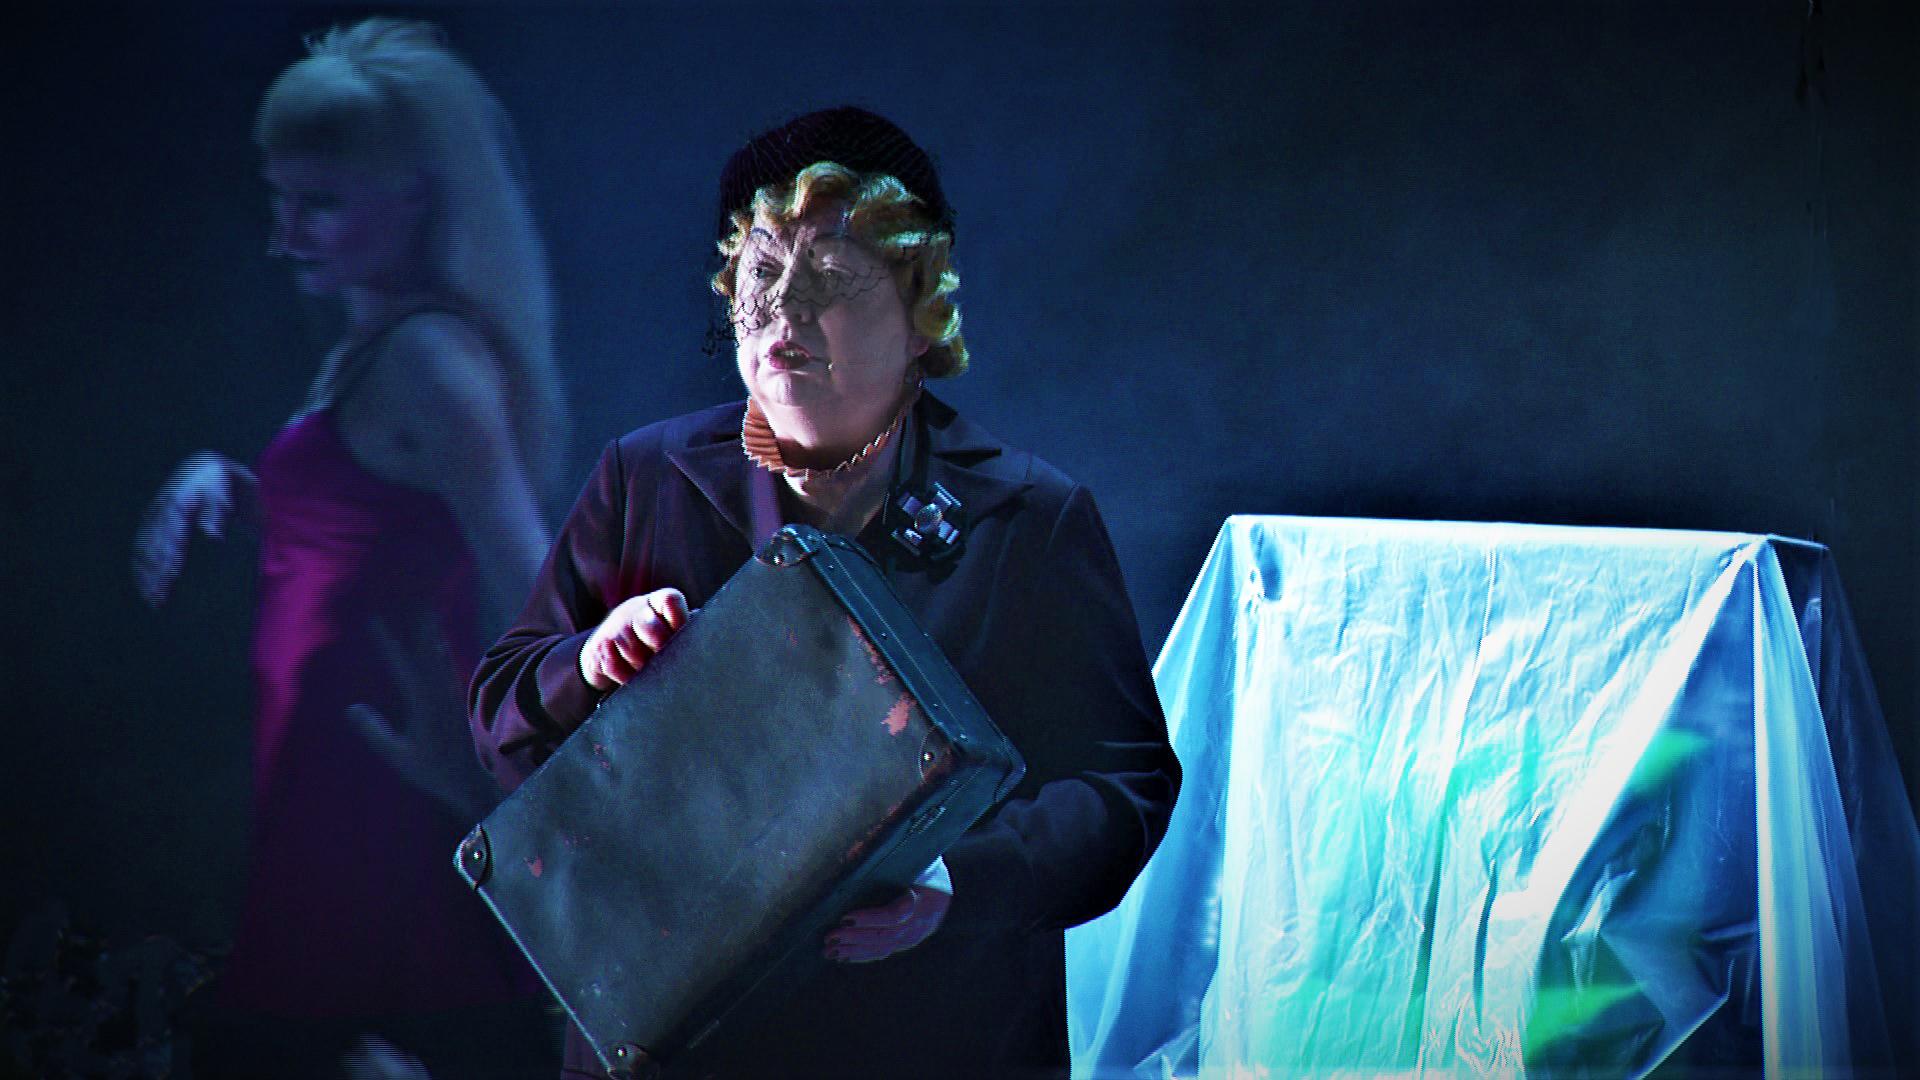 Фото из спектакля АБДТ им.Товстоногова «Жизнь впереди»